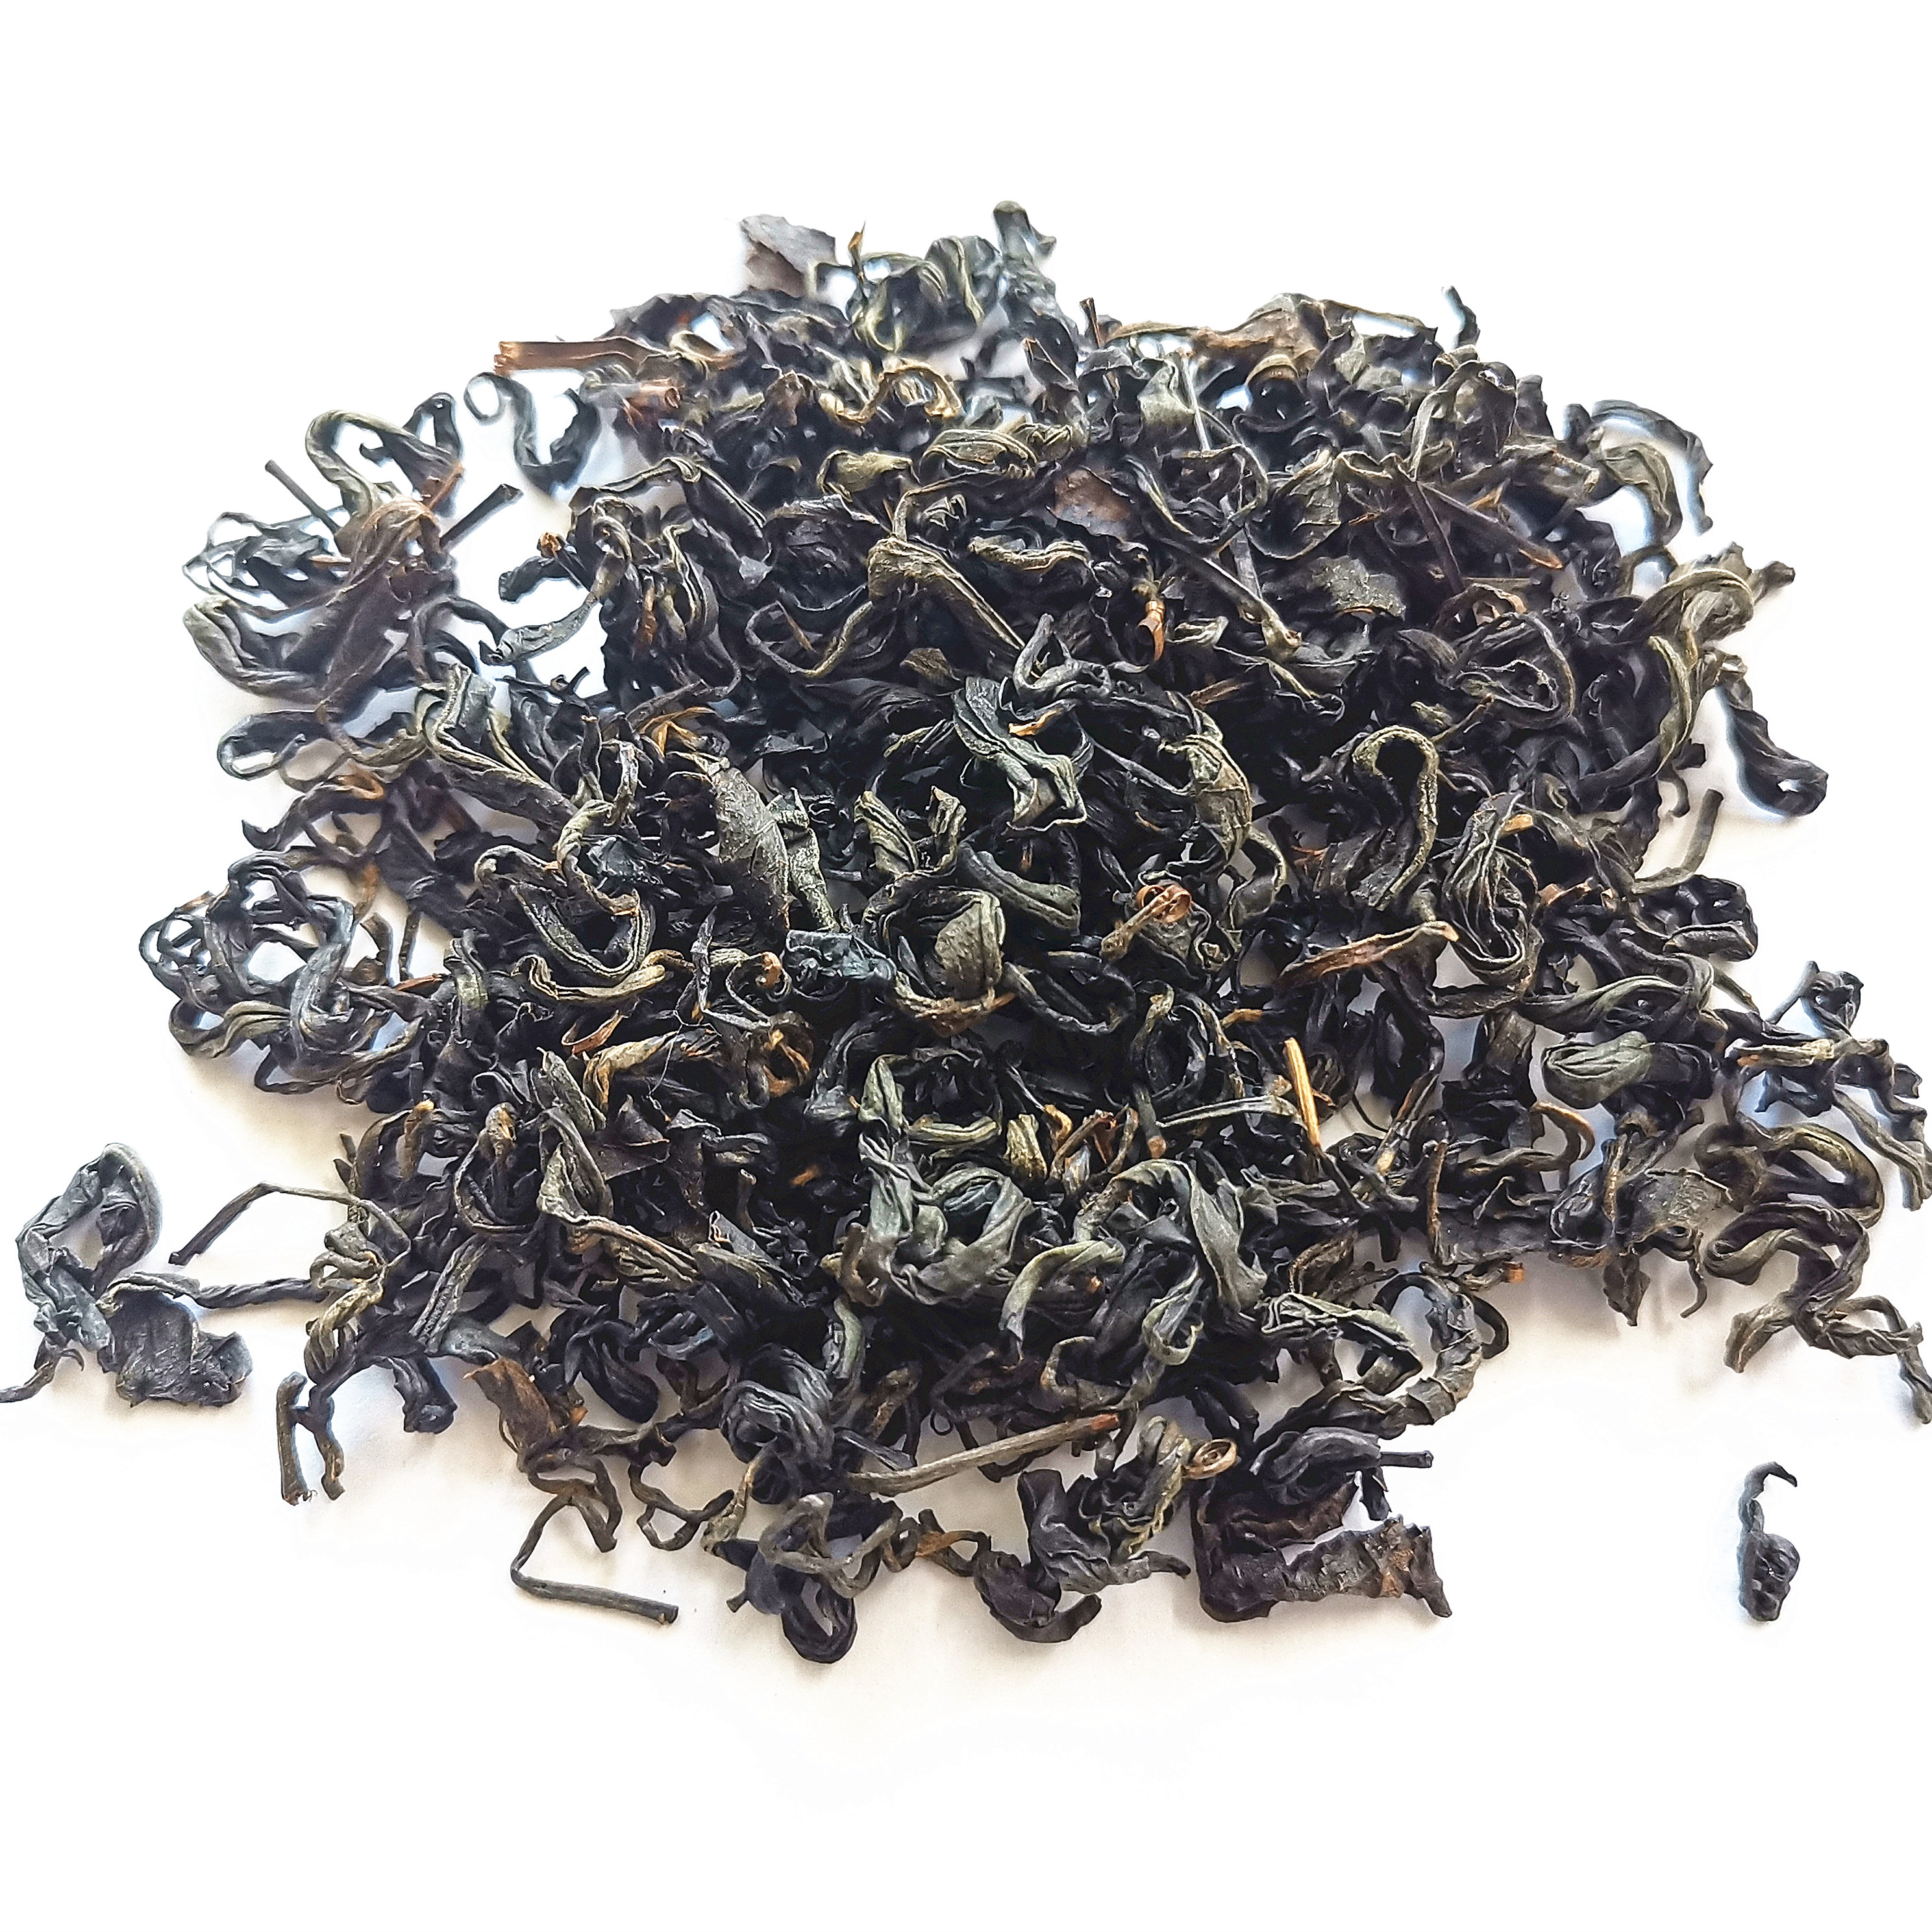 sam black tea loose healthy black tea - 4uTea   4uTea.com